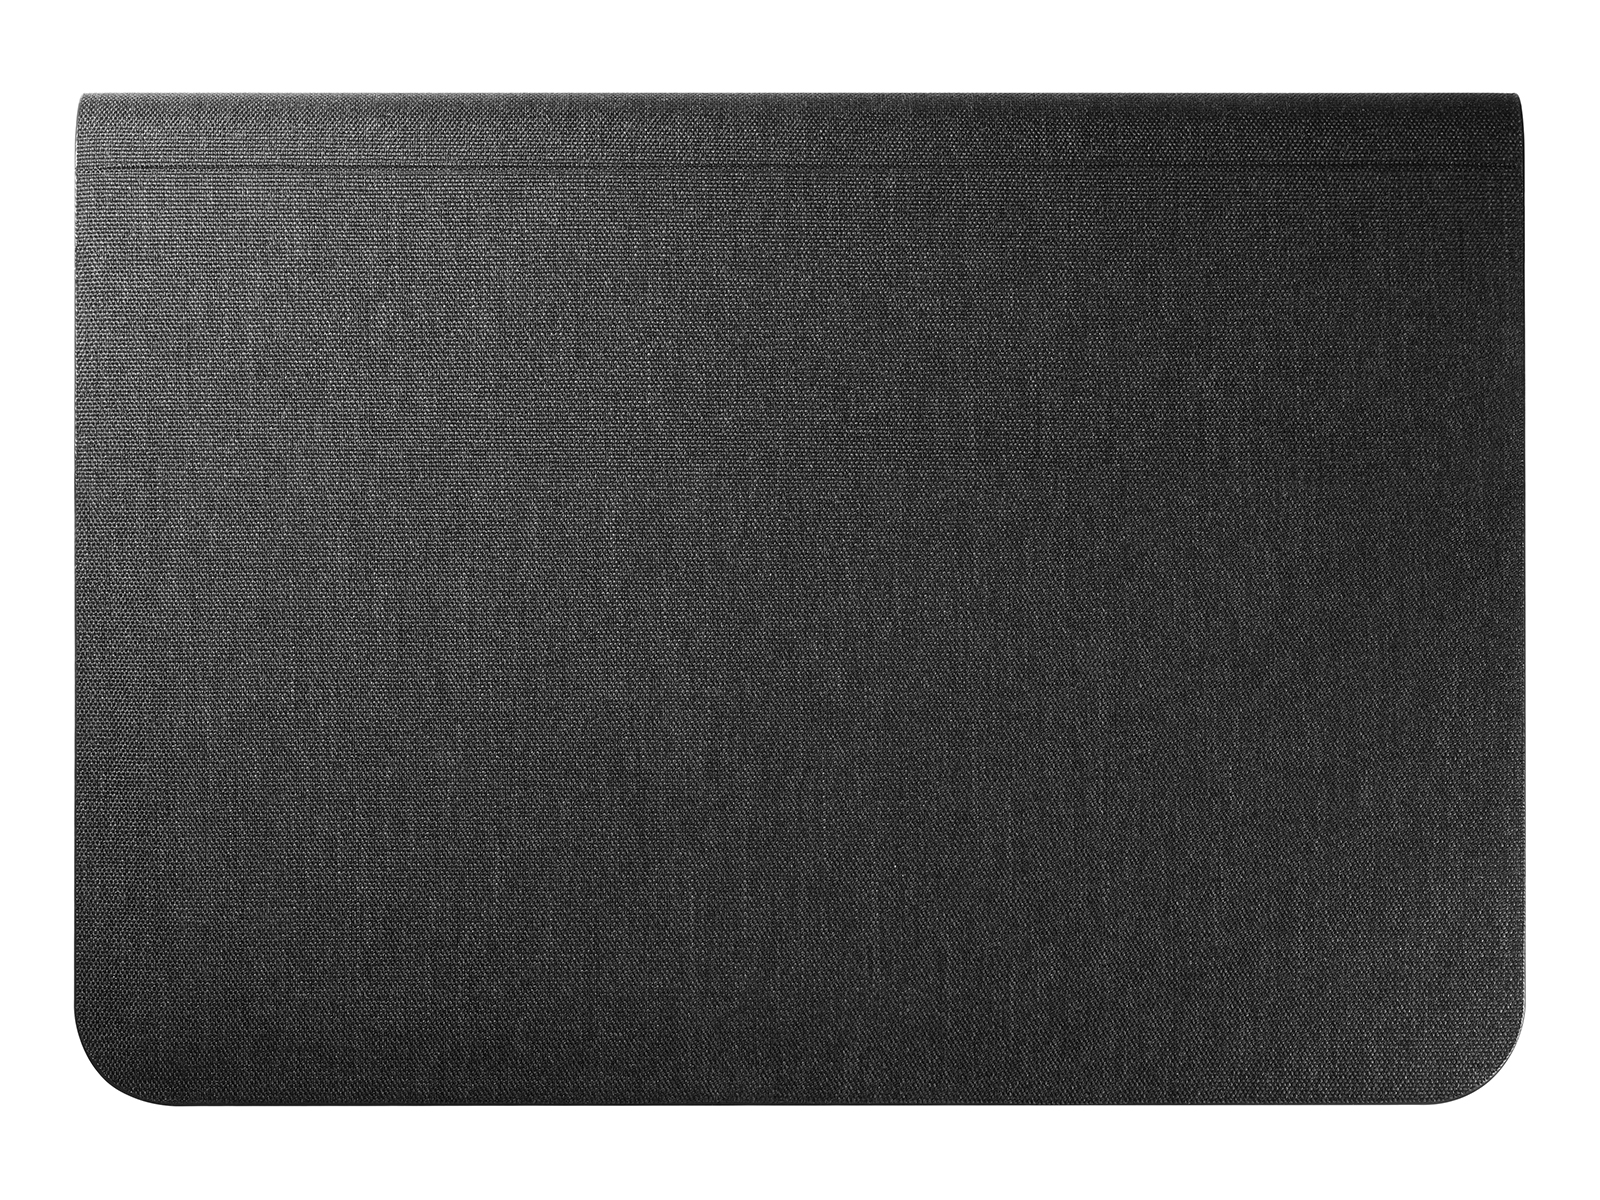 Samsung Chromebook Plus Pouch, Black